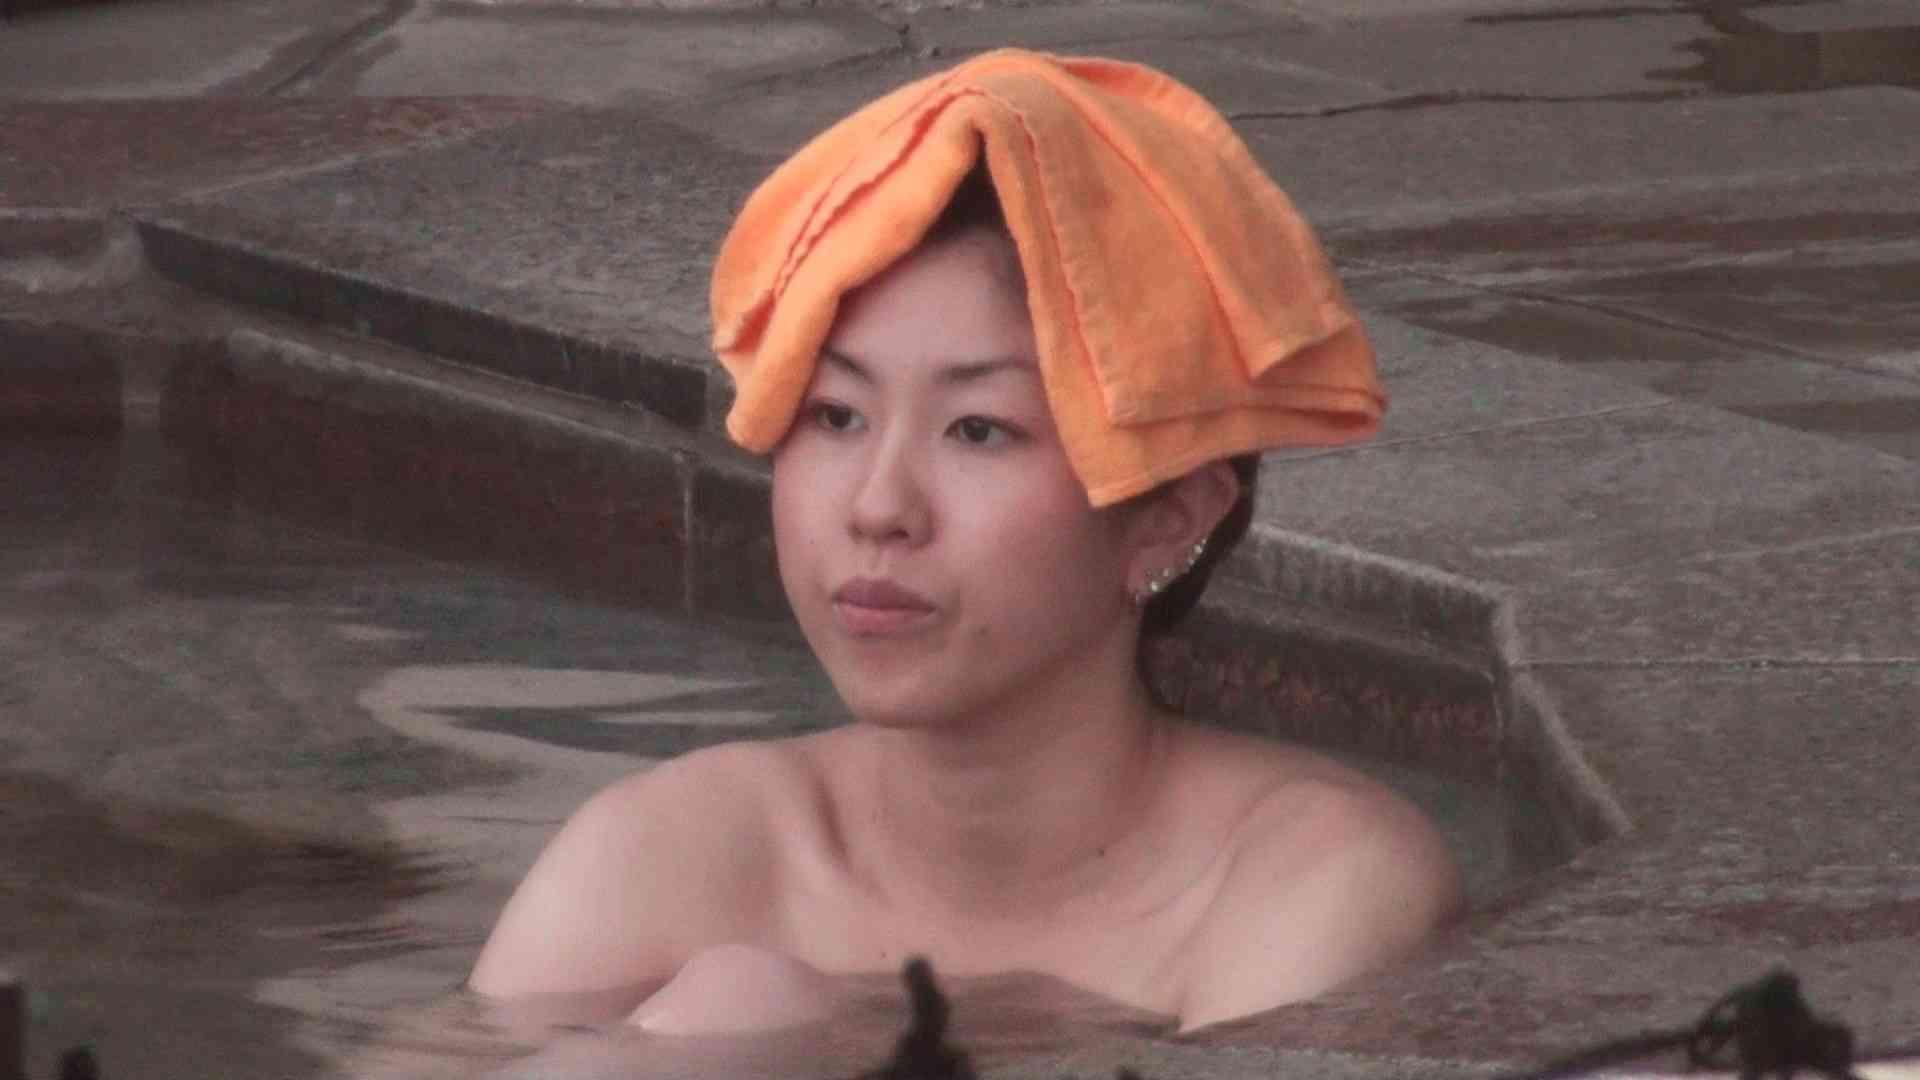 Aquaな露天風呂Vol.135 盗撮シリーズ | 露天風呂編  84PIX 75